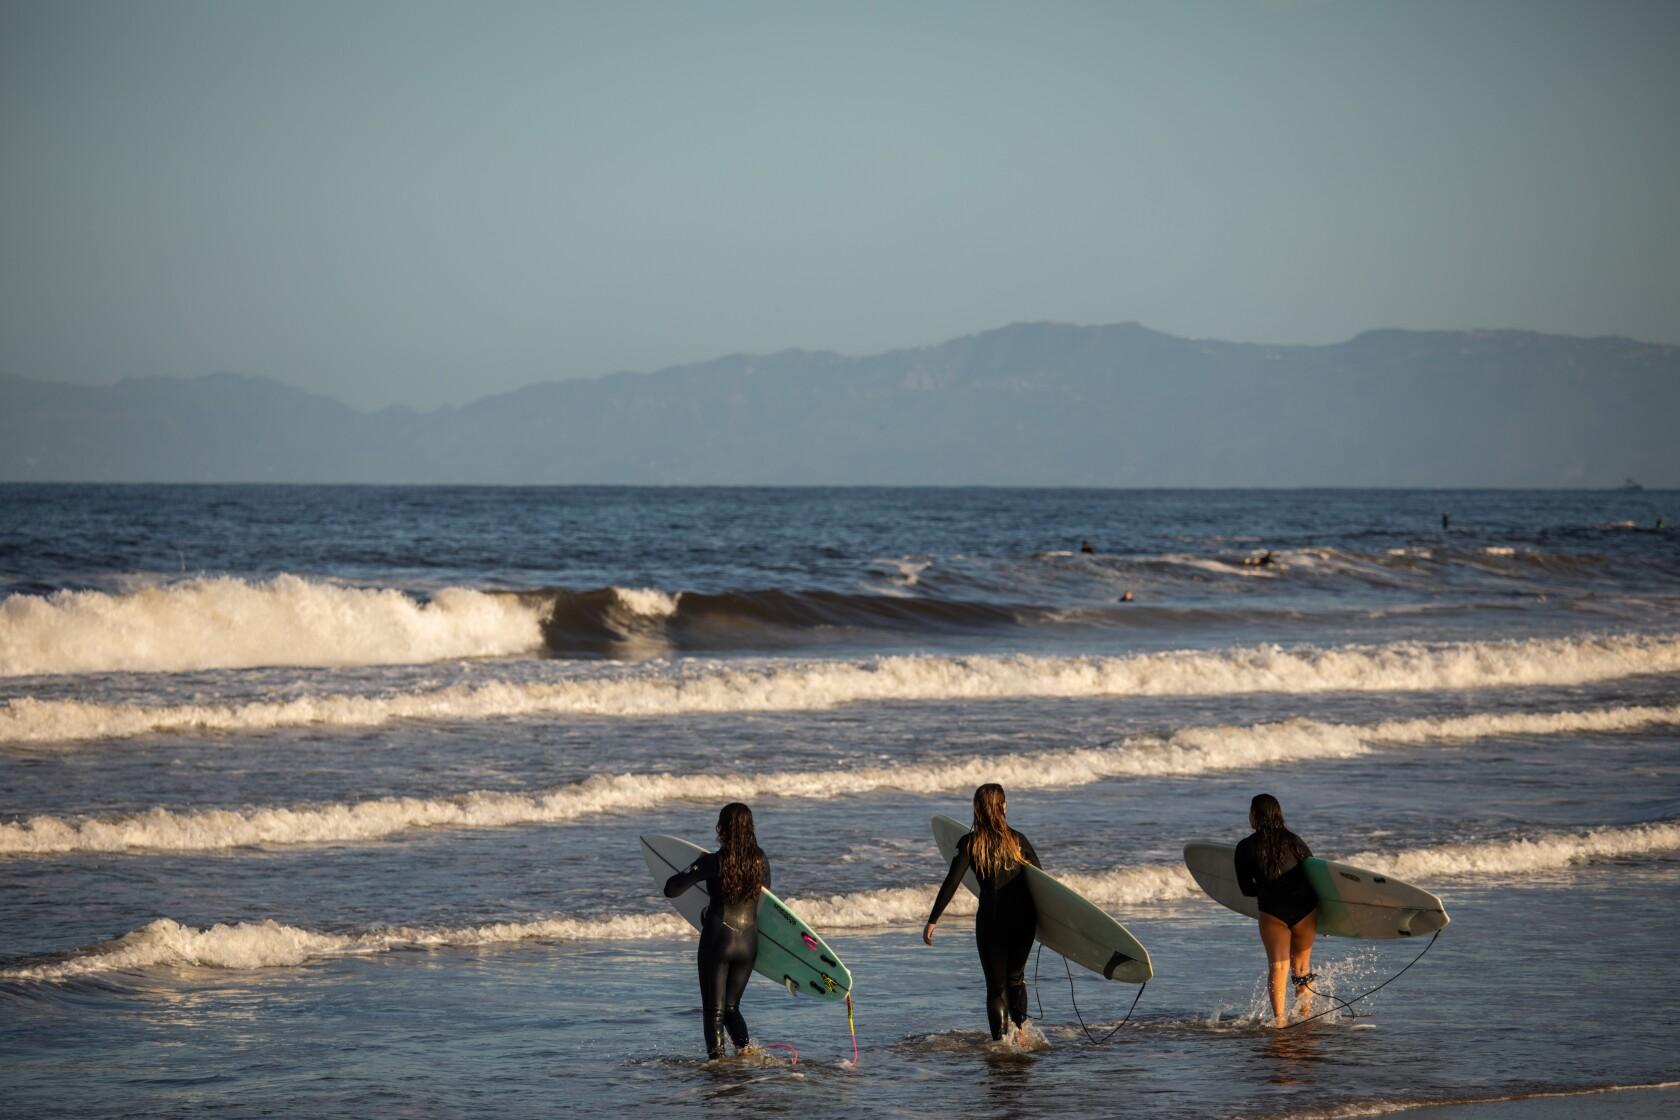 Los Angeles County beaches reopen in a coronavirus milestone